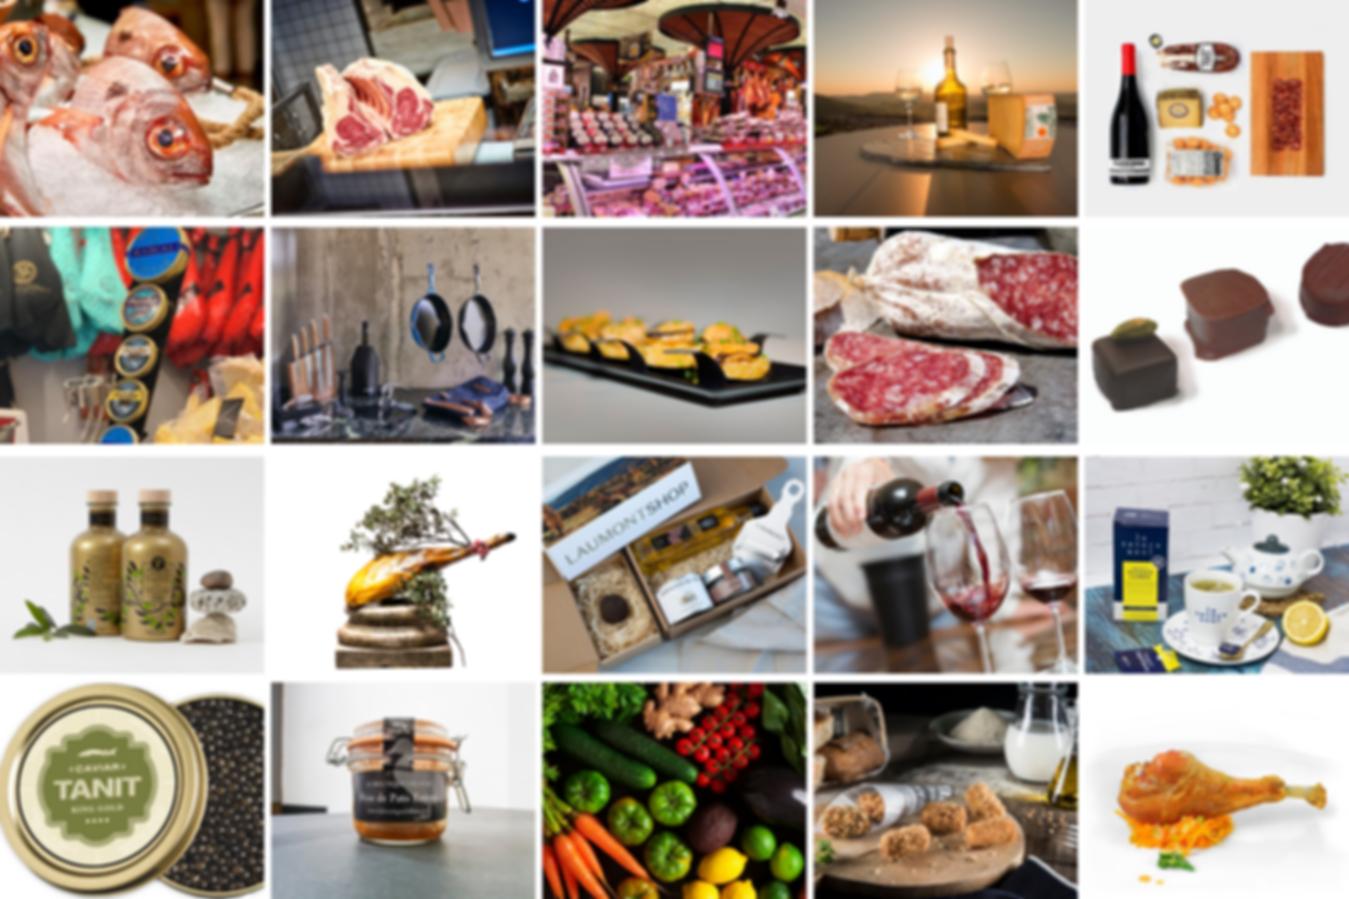 Portada (Tiendas online) - GastroMadrid